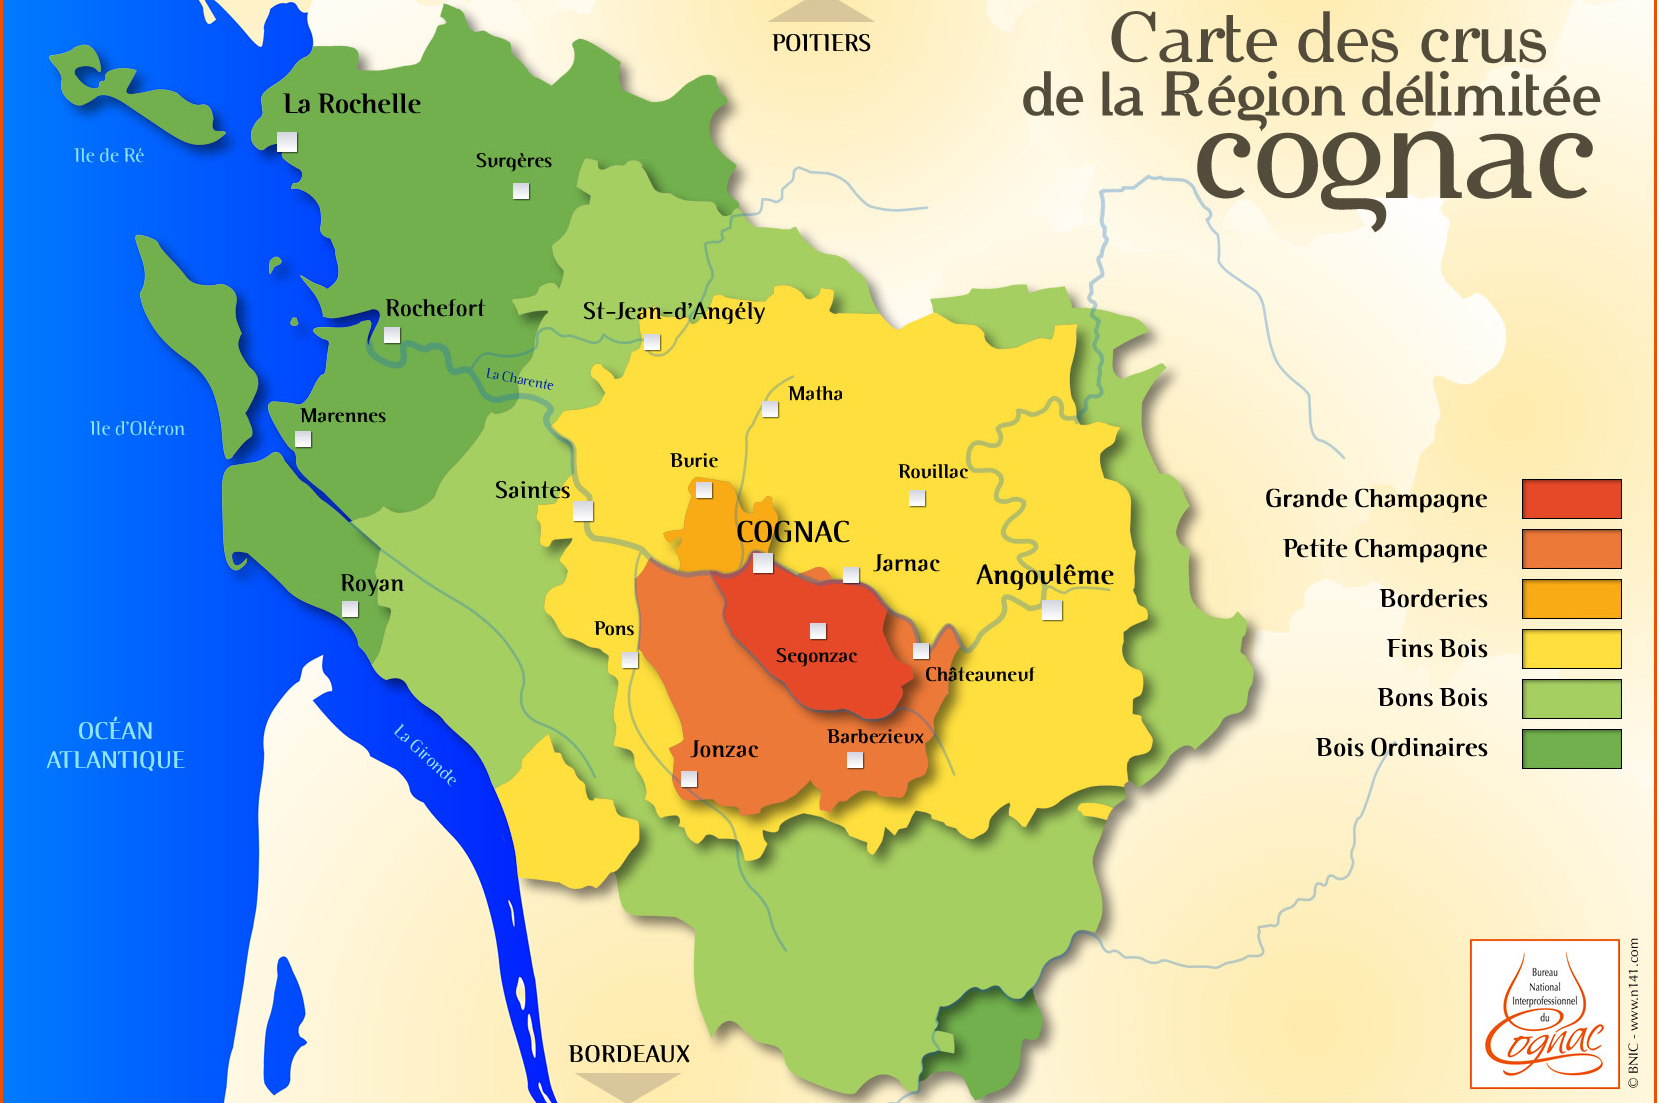 carte des crus de cognac